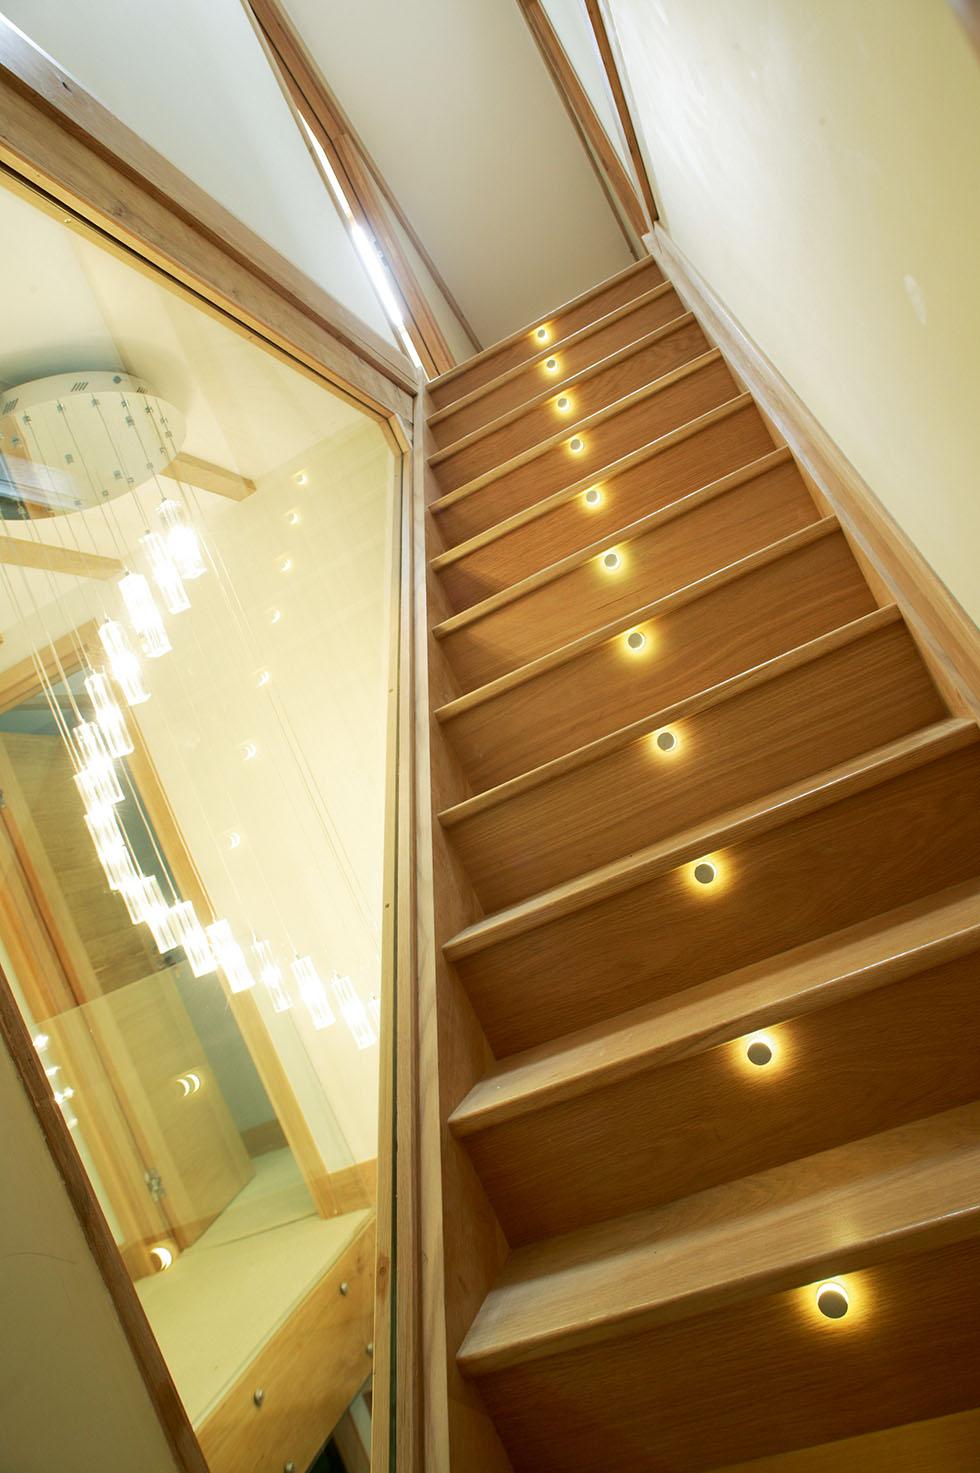 blain-bakehouse-stairs